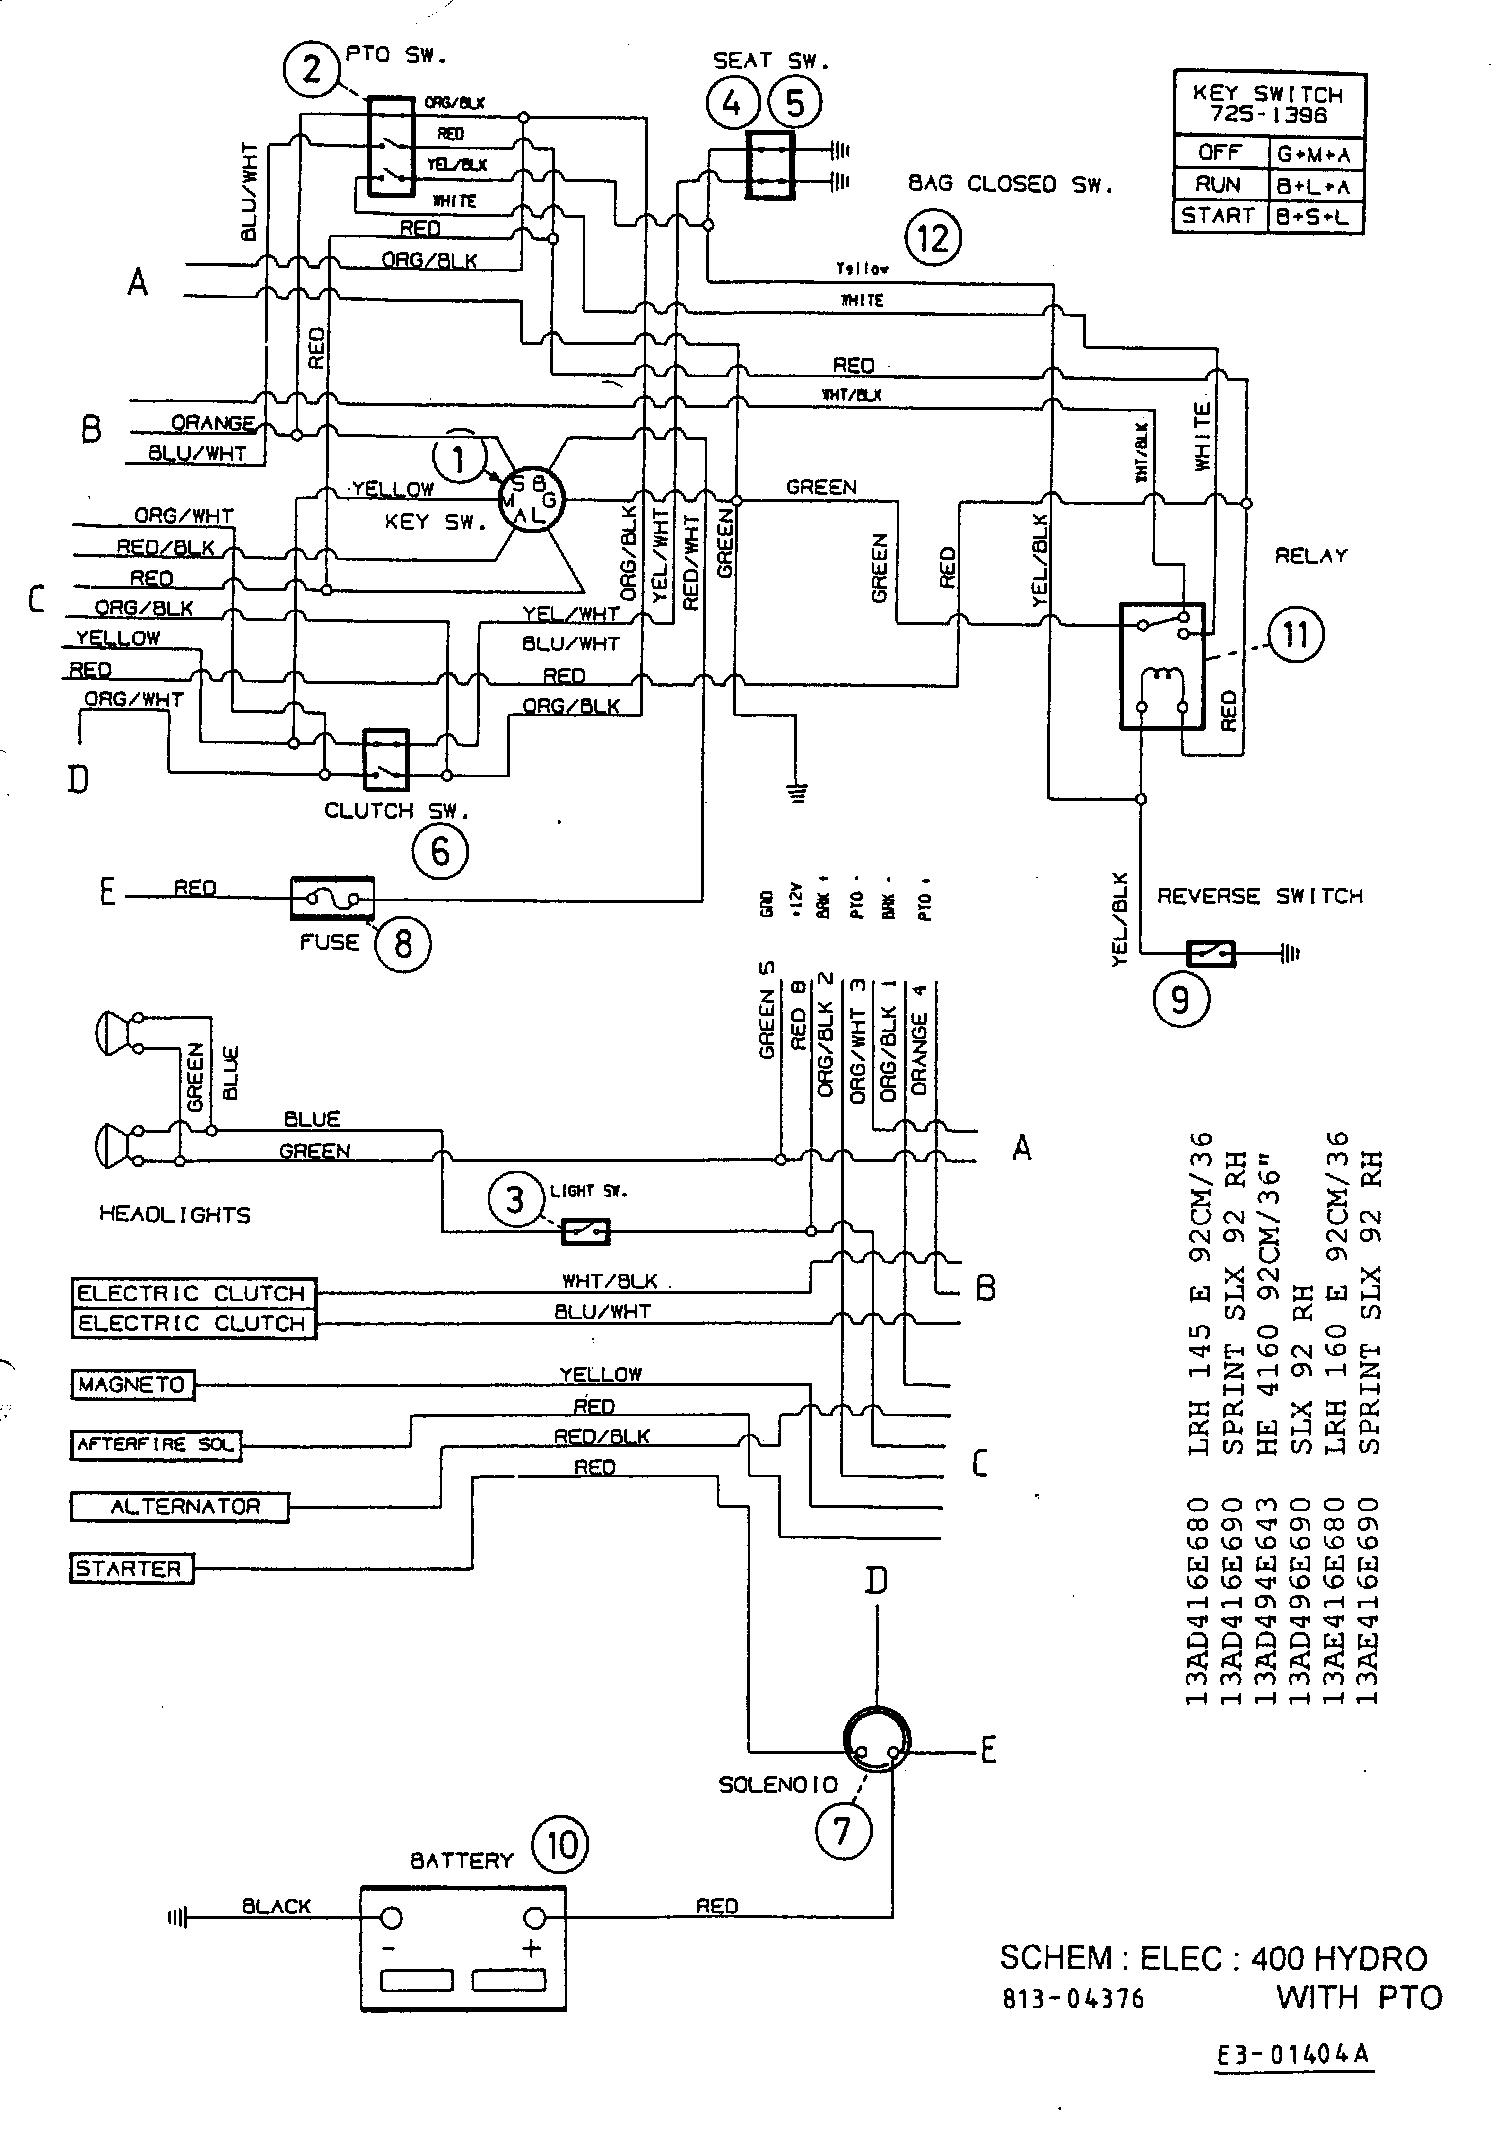 Yard-Man HE 4160 Schaltplan 13AD494E643 (1999)